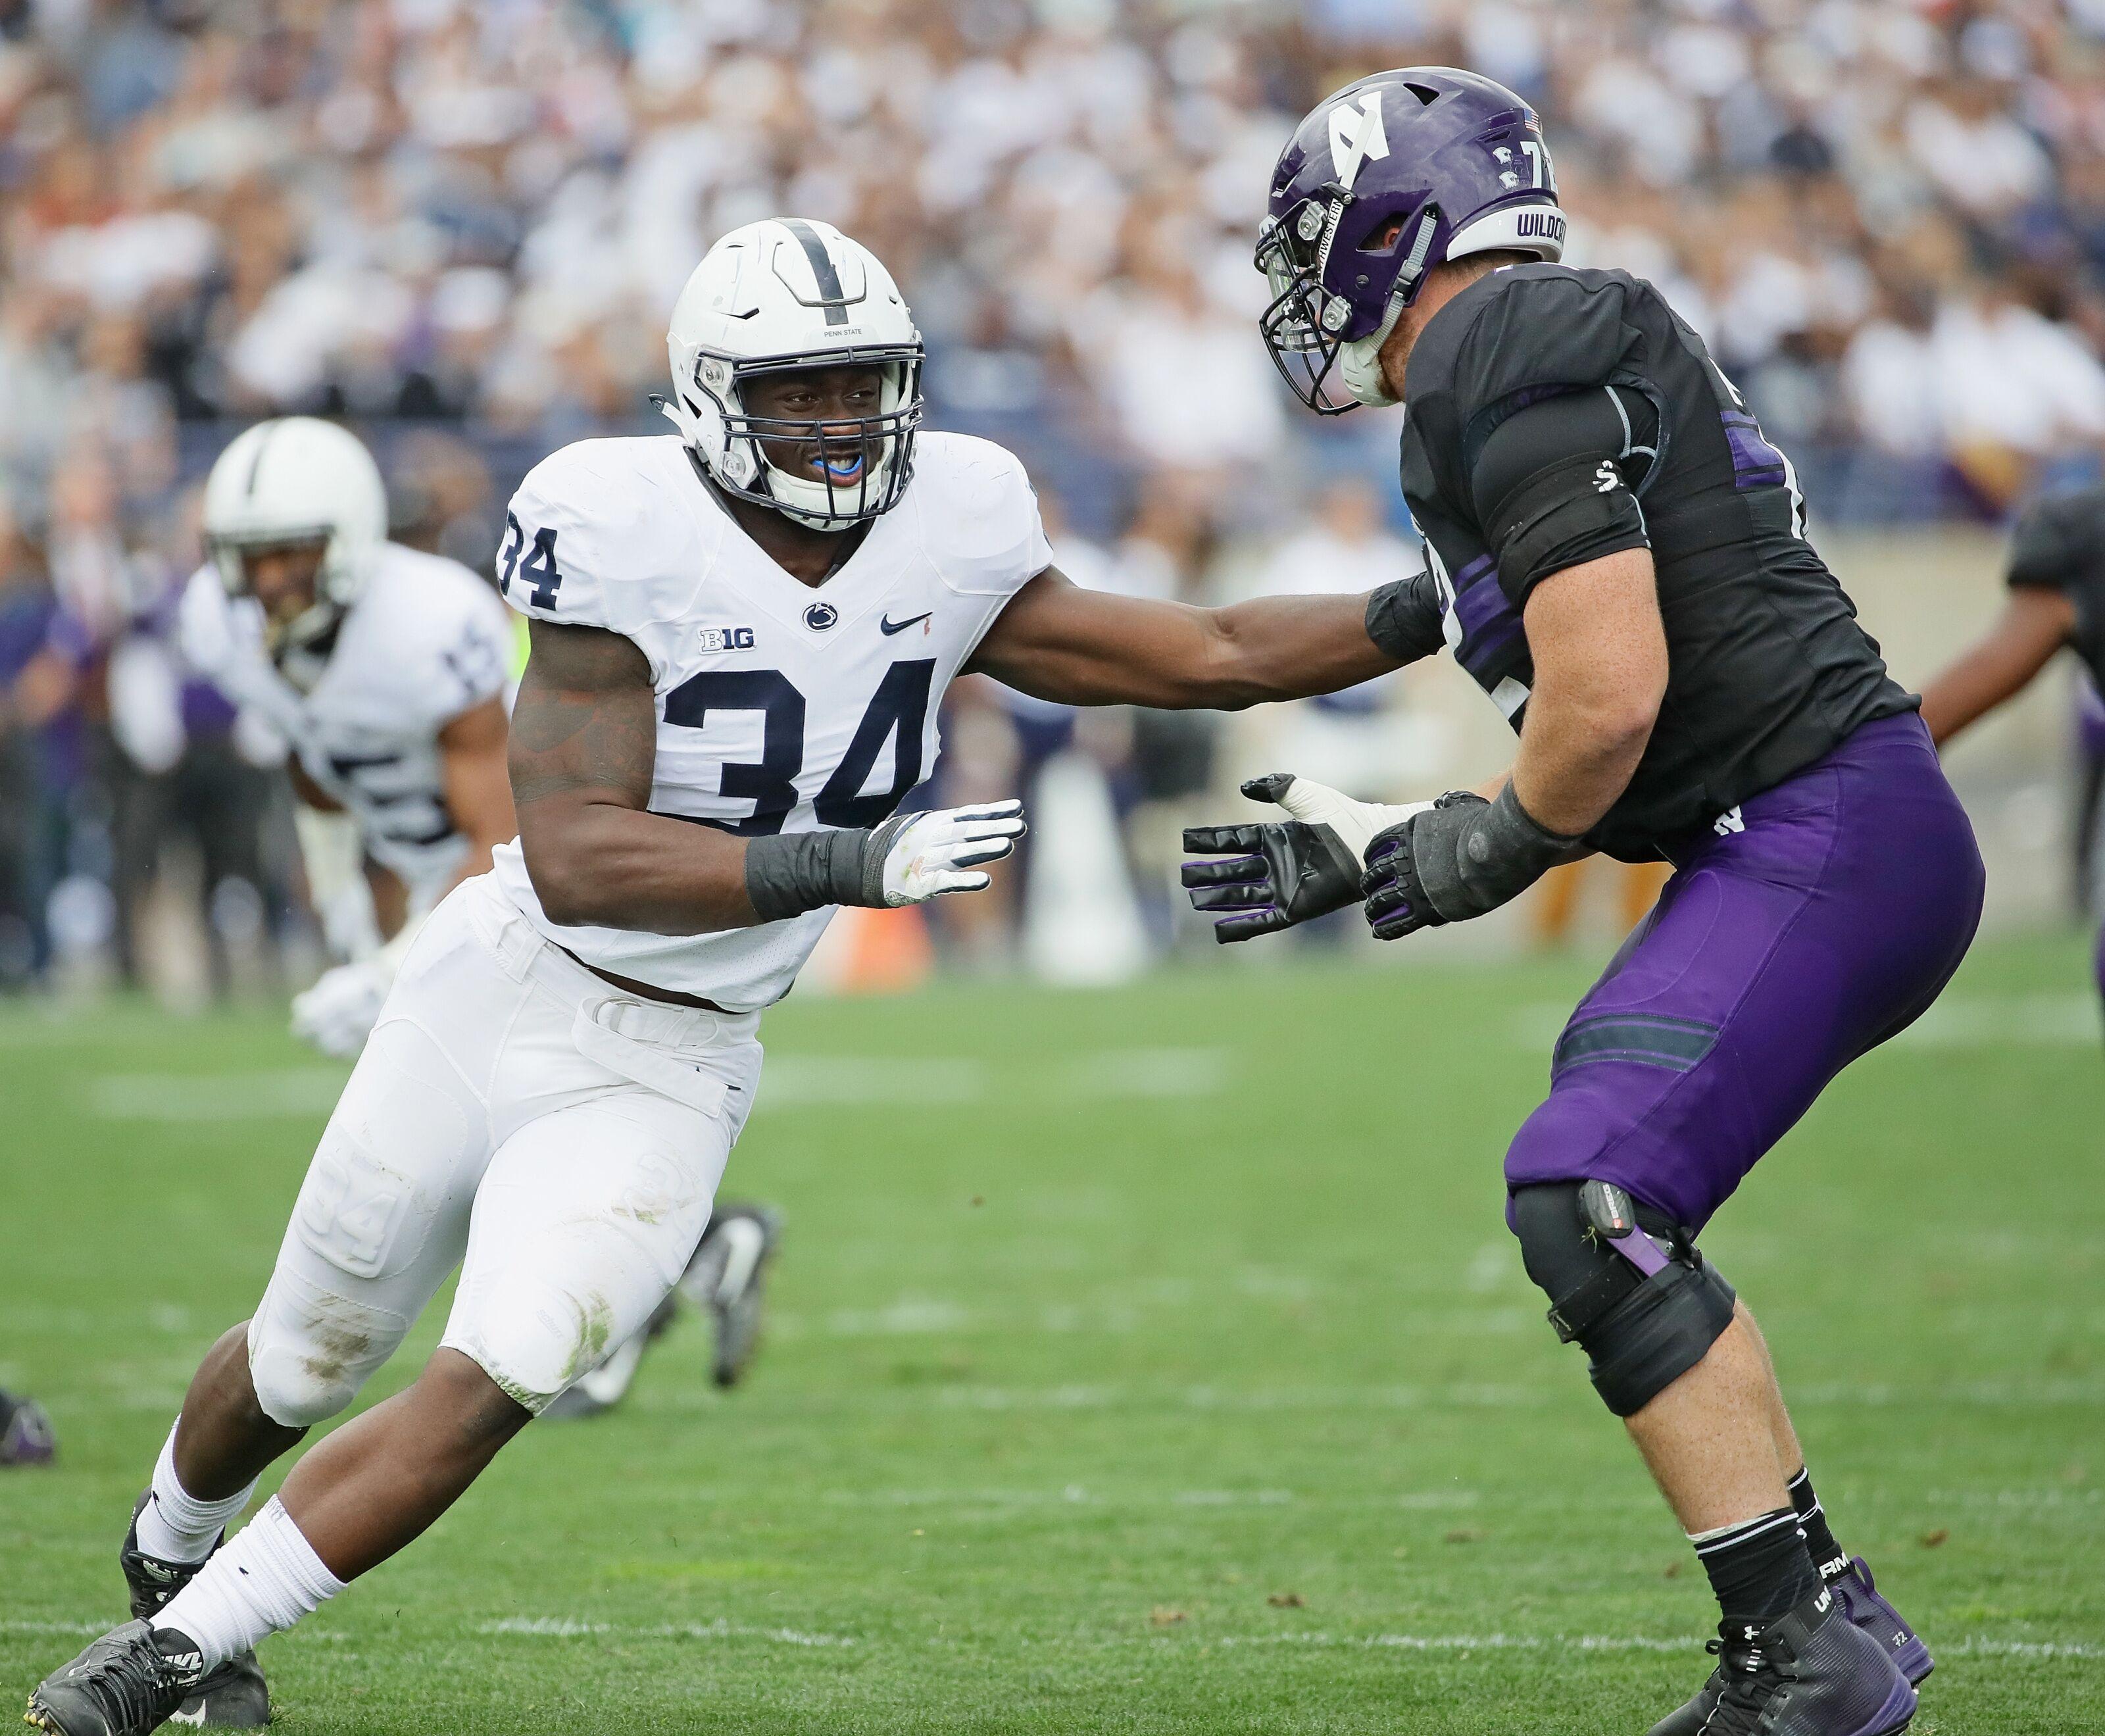 Penn State Football 2019 Breakout Candidate: DE Shane Simmons